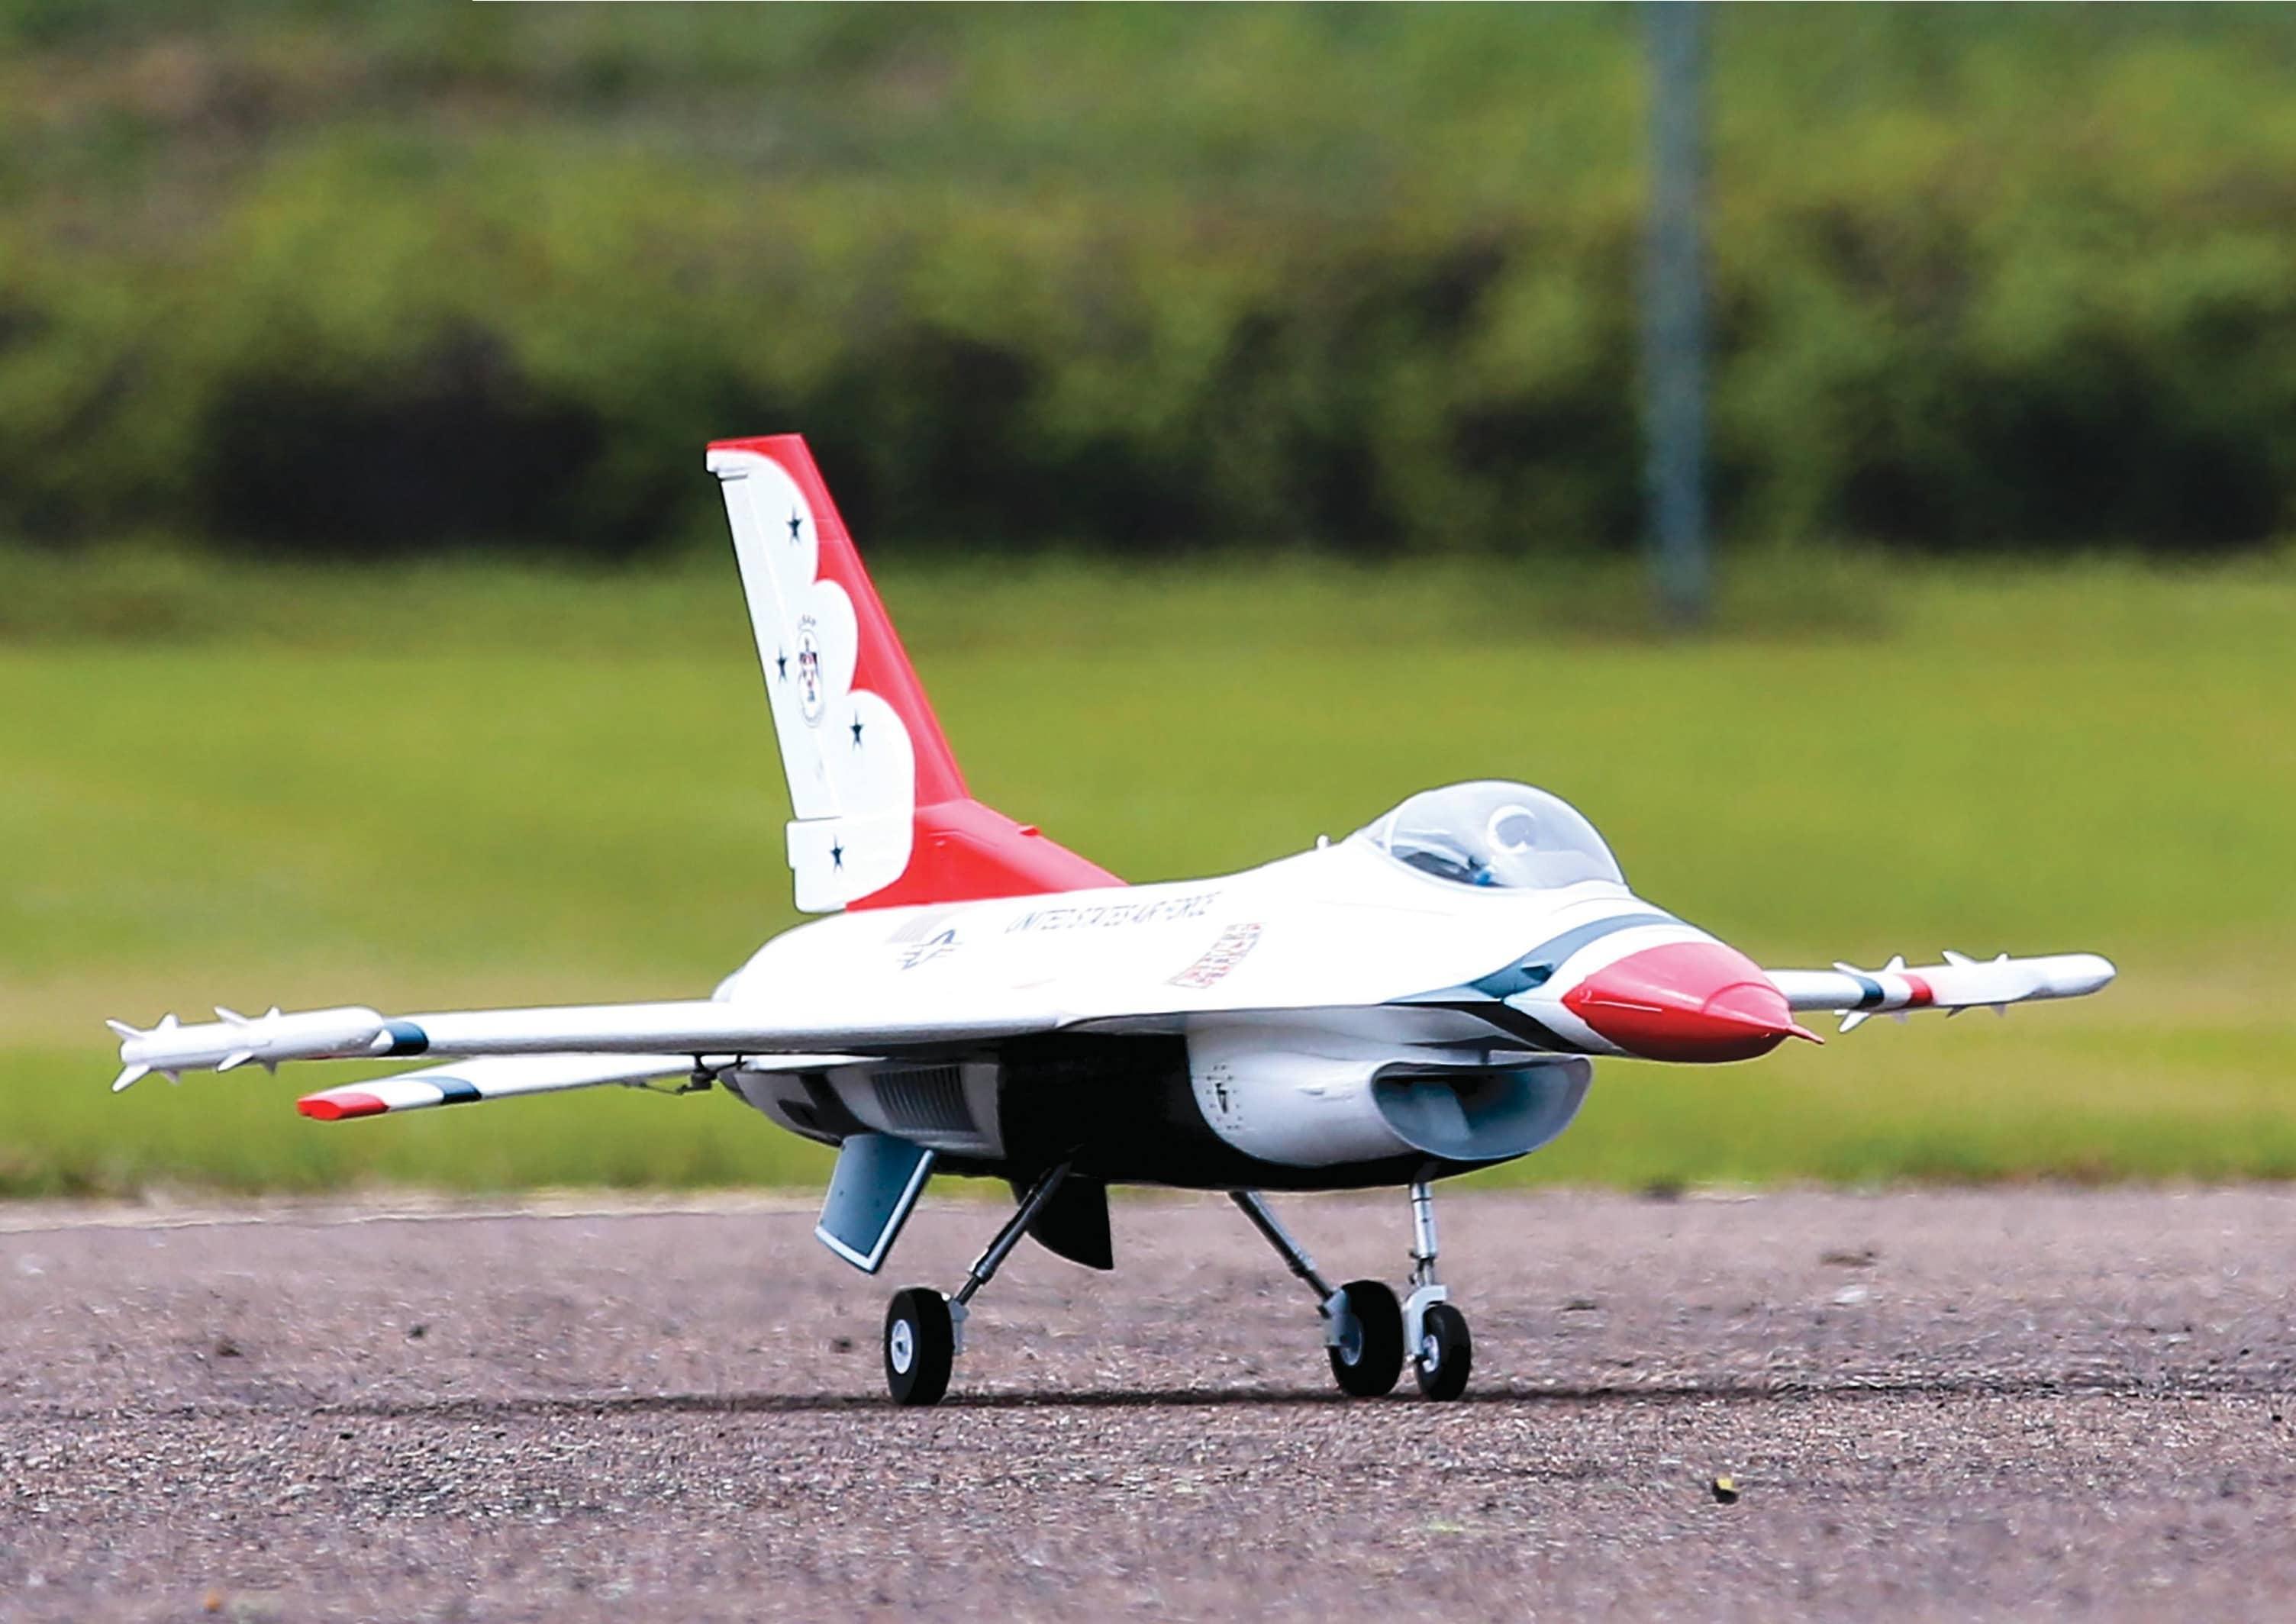 E-Flite/Horizon Hobby F-16 Thunderbirds 70mm EDF